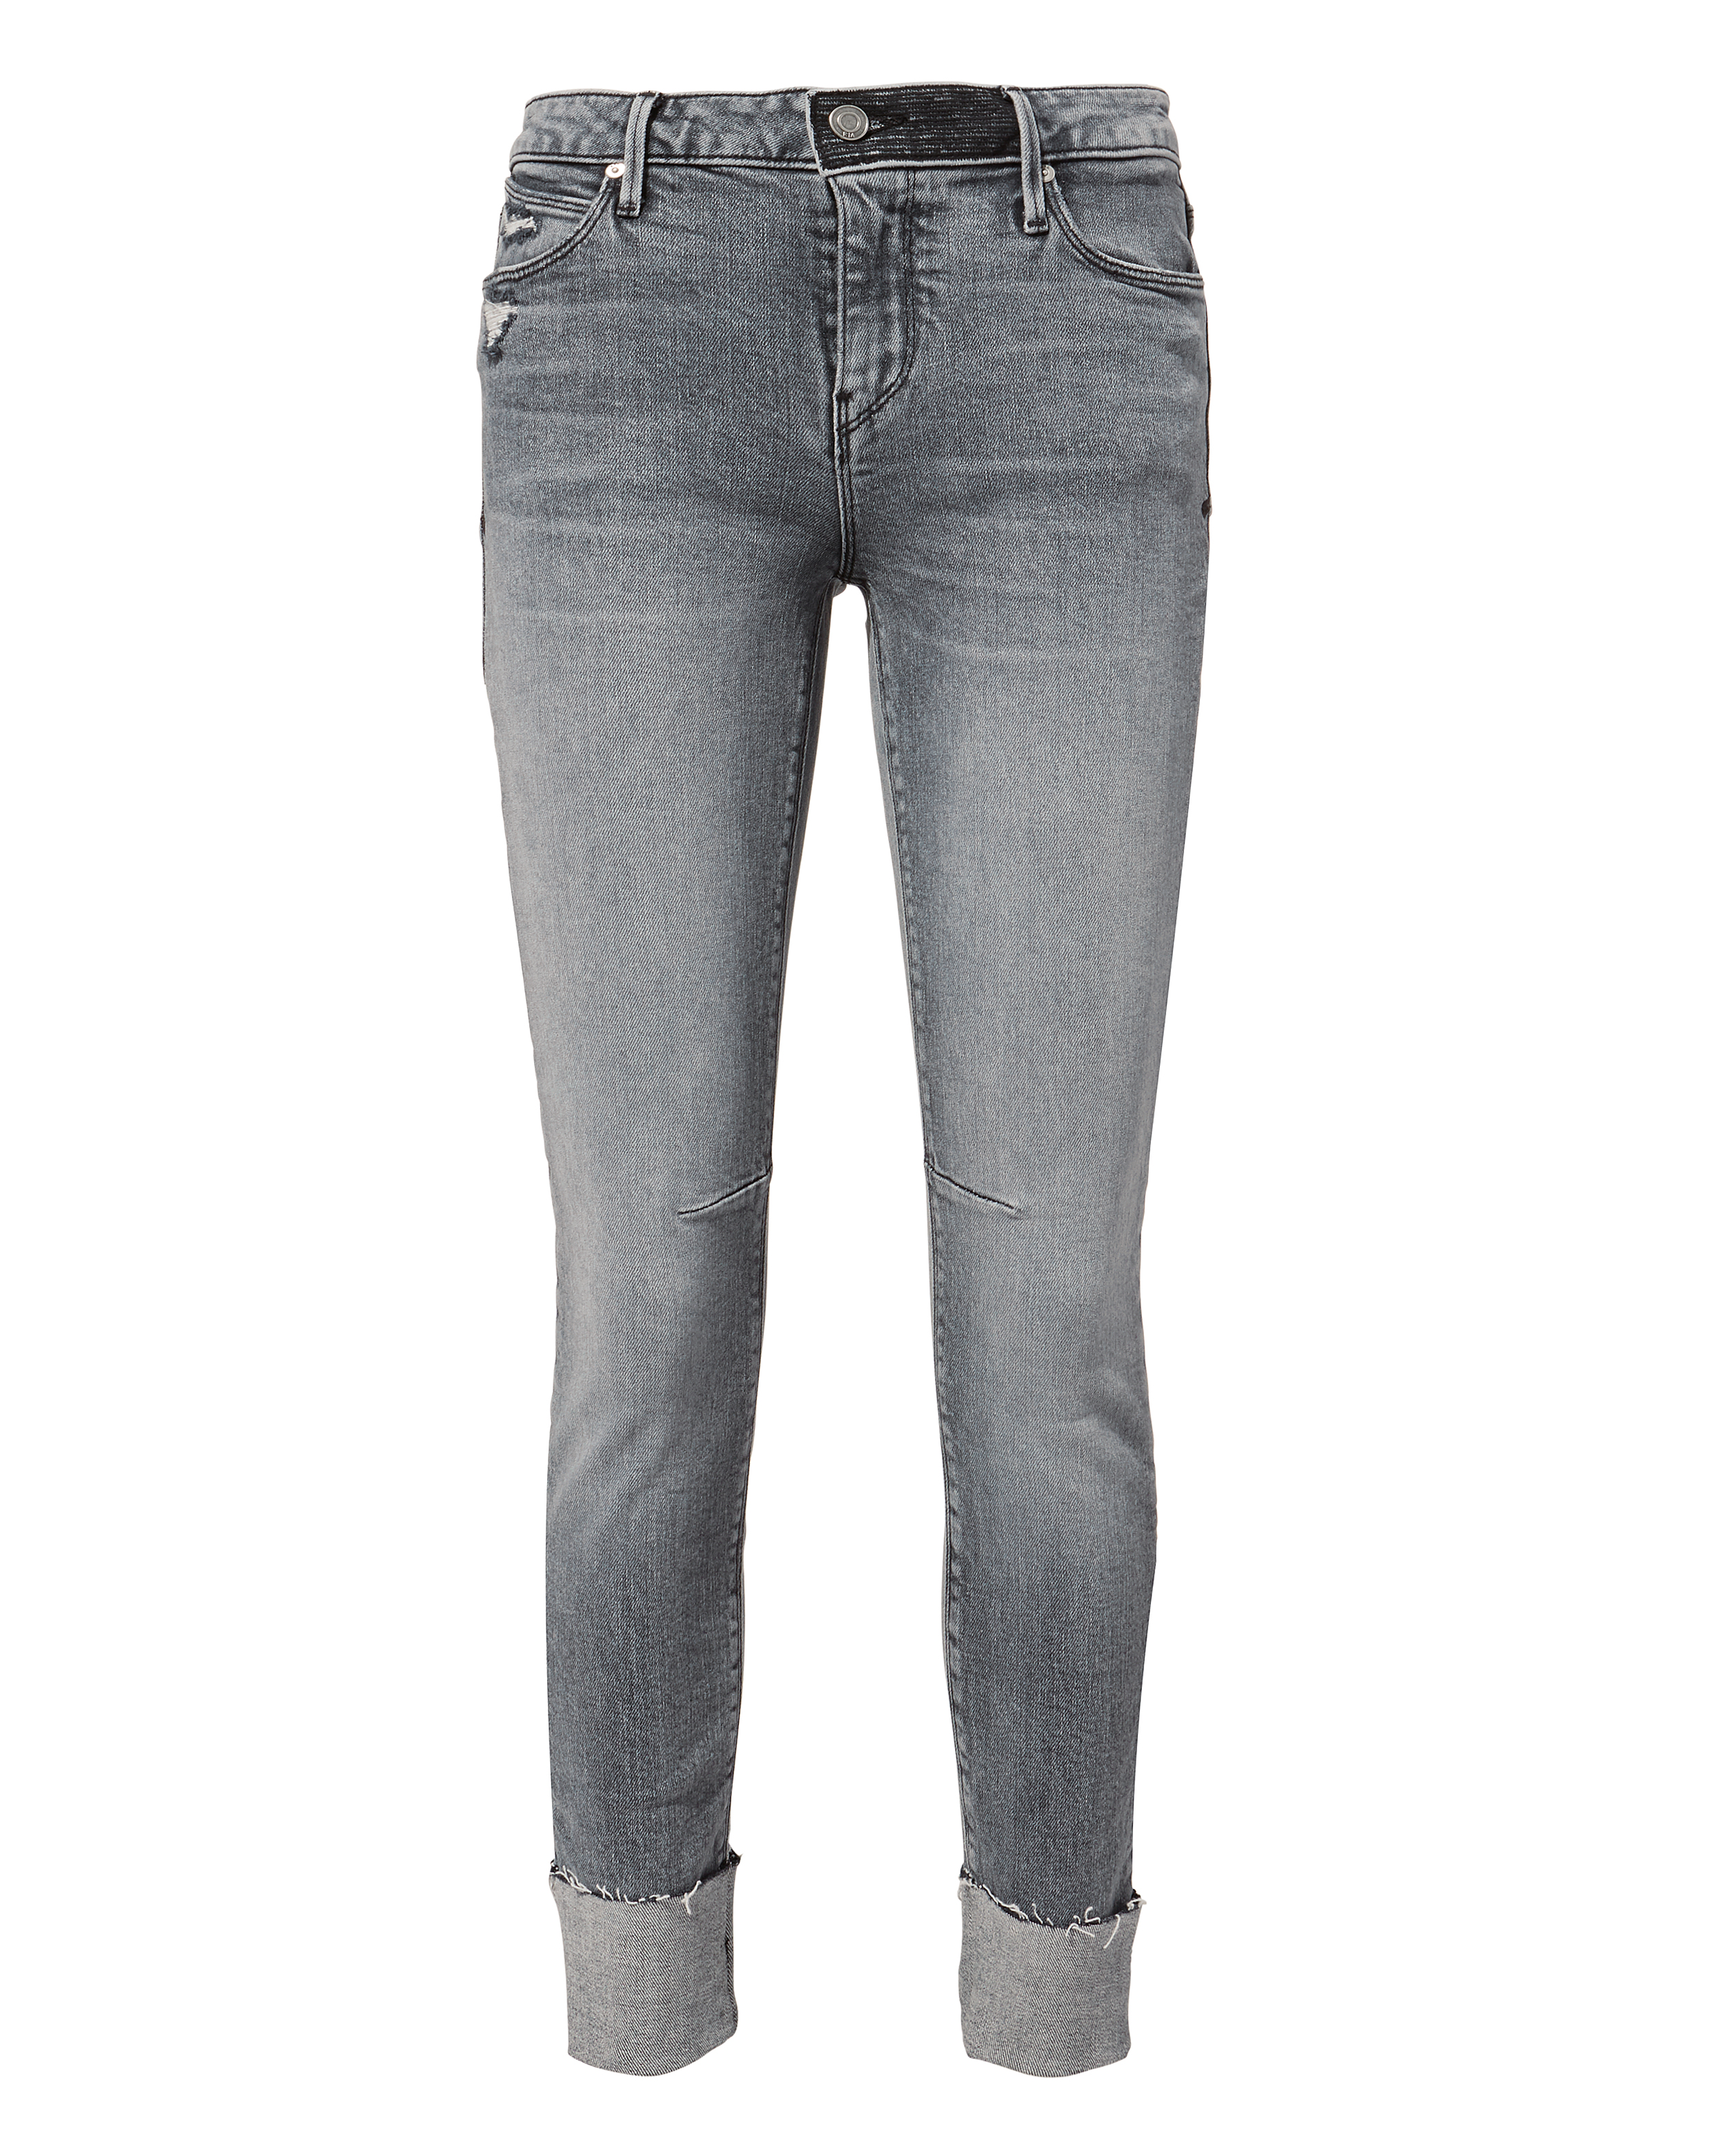 Rta Nova Mid-Rise Skinny Jeans In Grey  d3a8df43c67